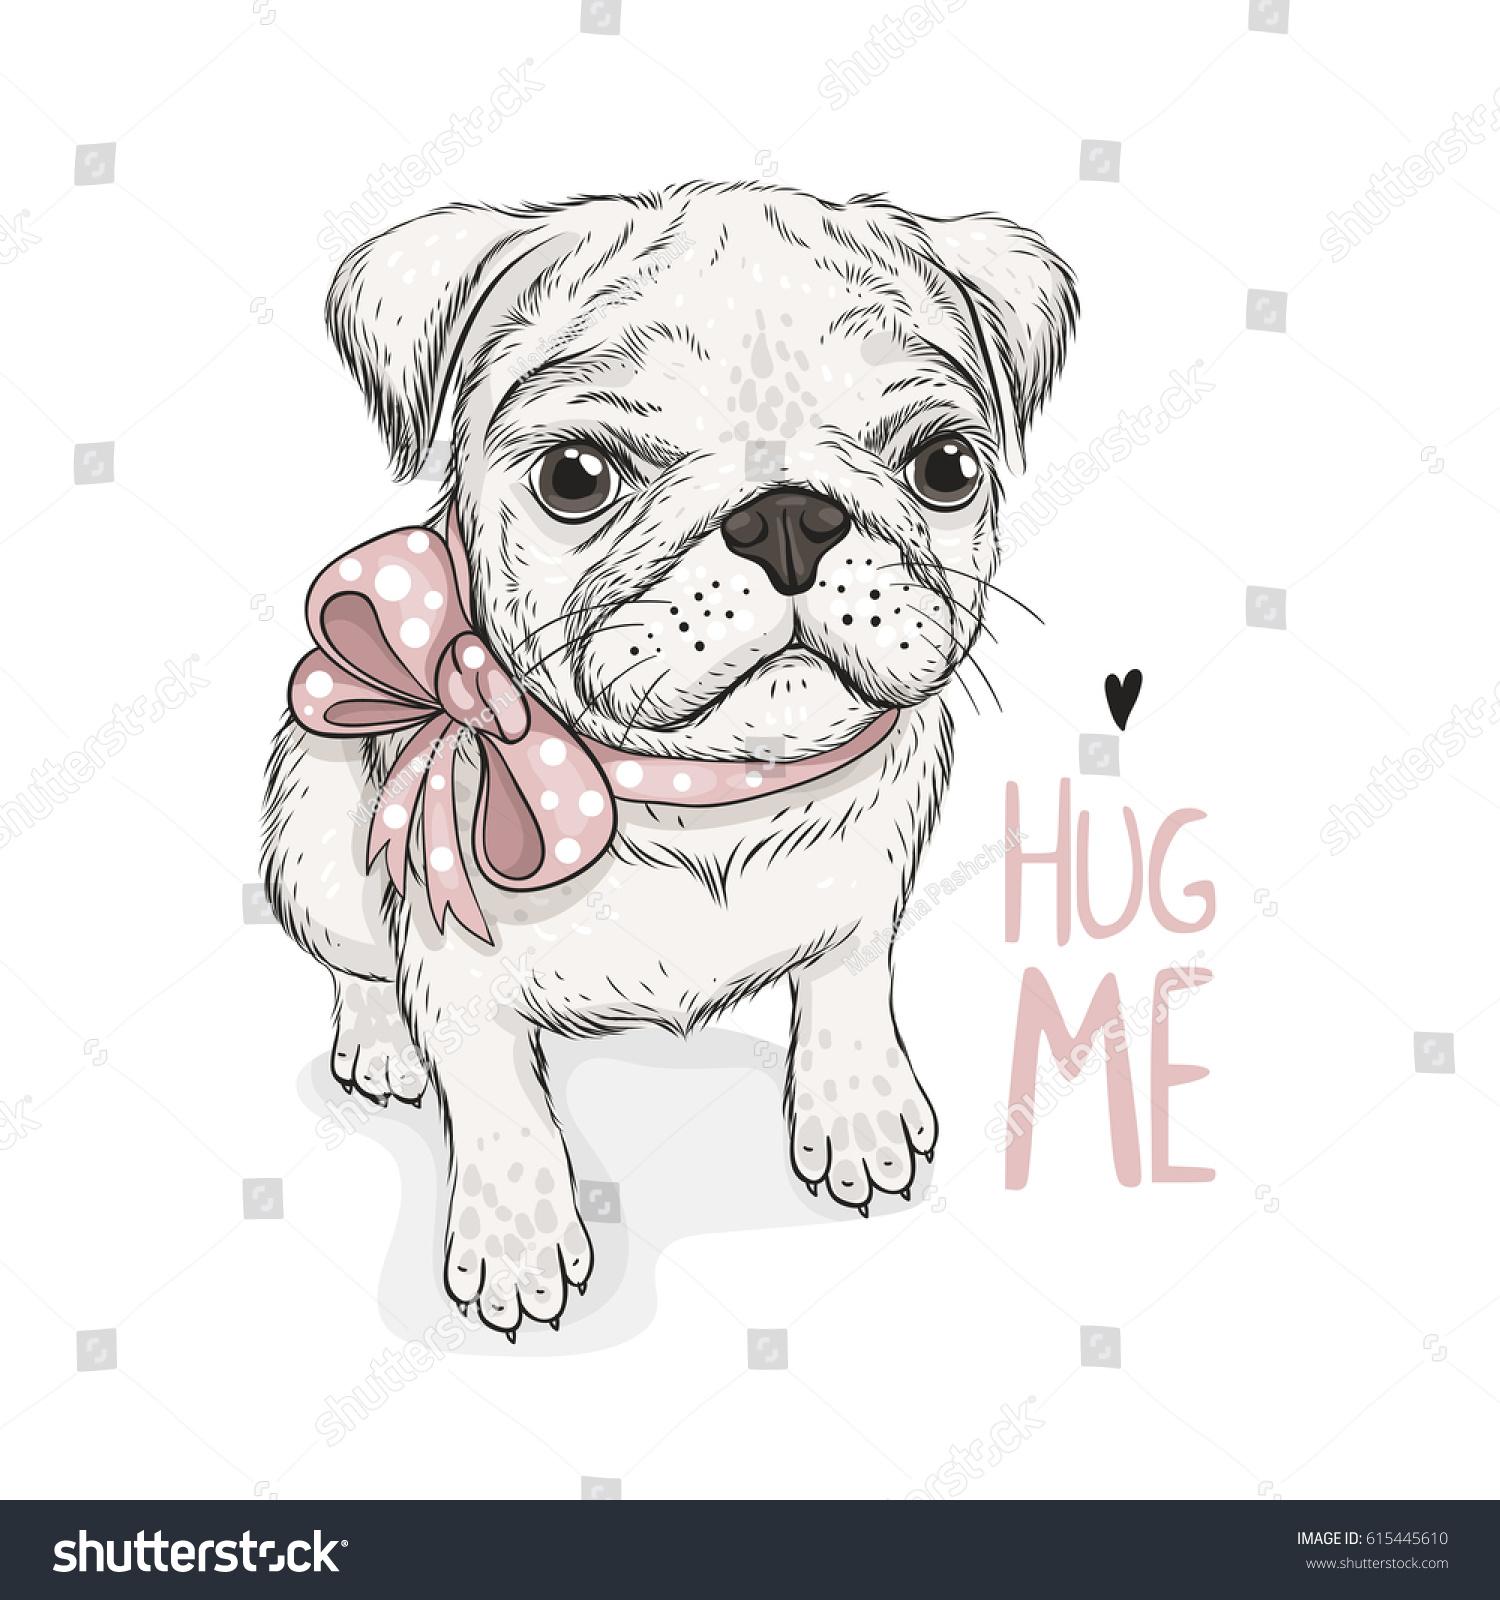 puppy pug bow phrase hug me stock vector 615445610 shutterstock